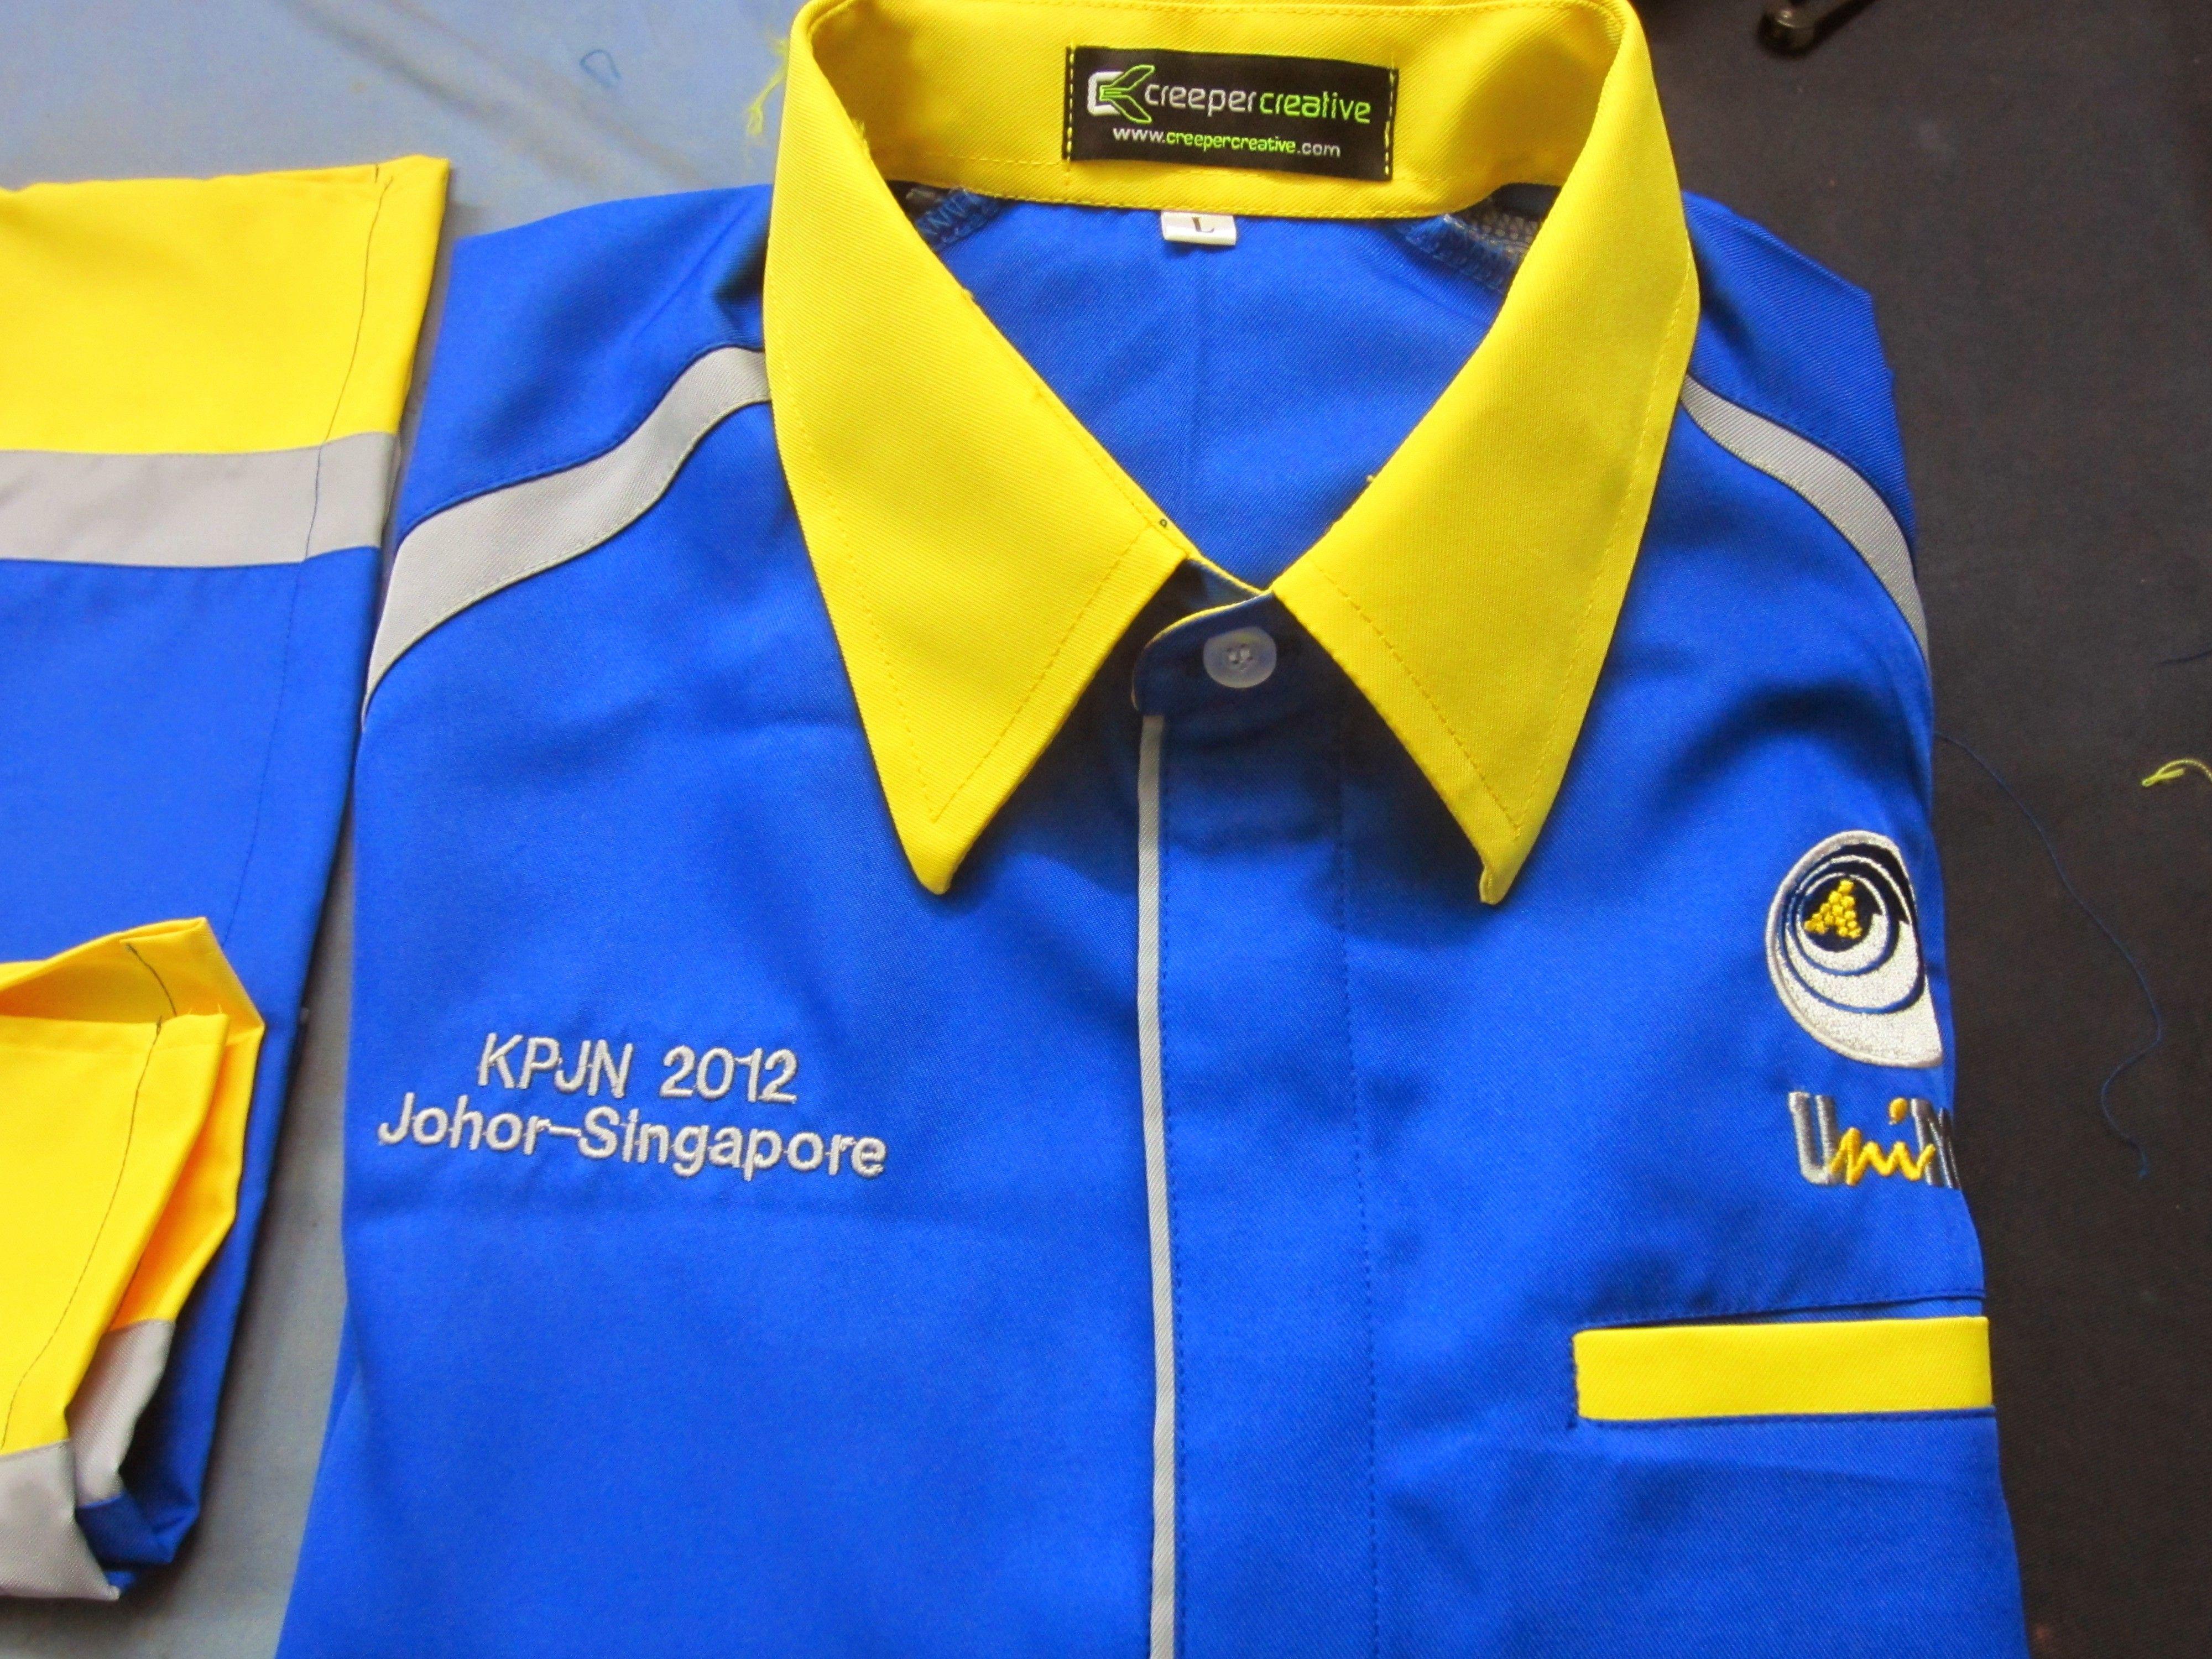 Baju Koprat Muslimah +60103425700 Uniforms WhatsApp Us